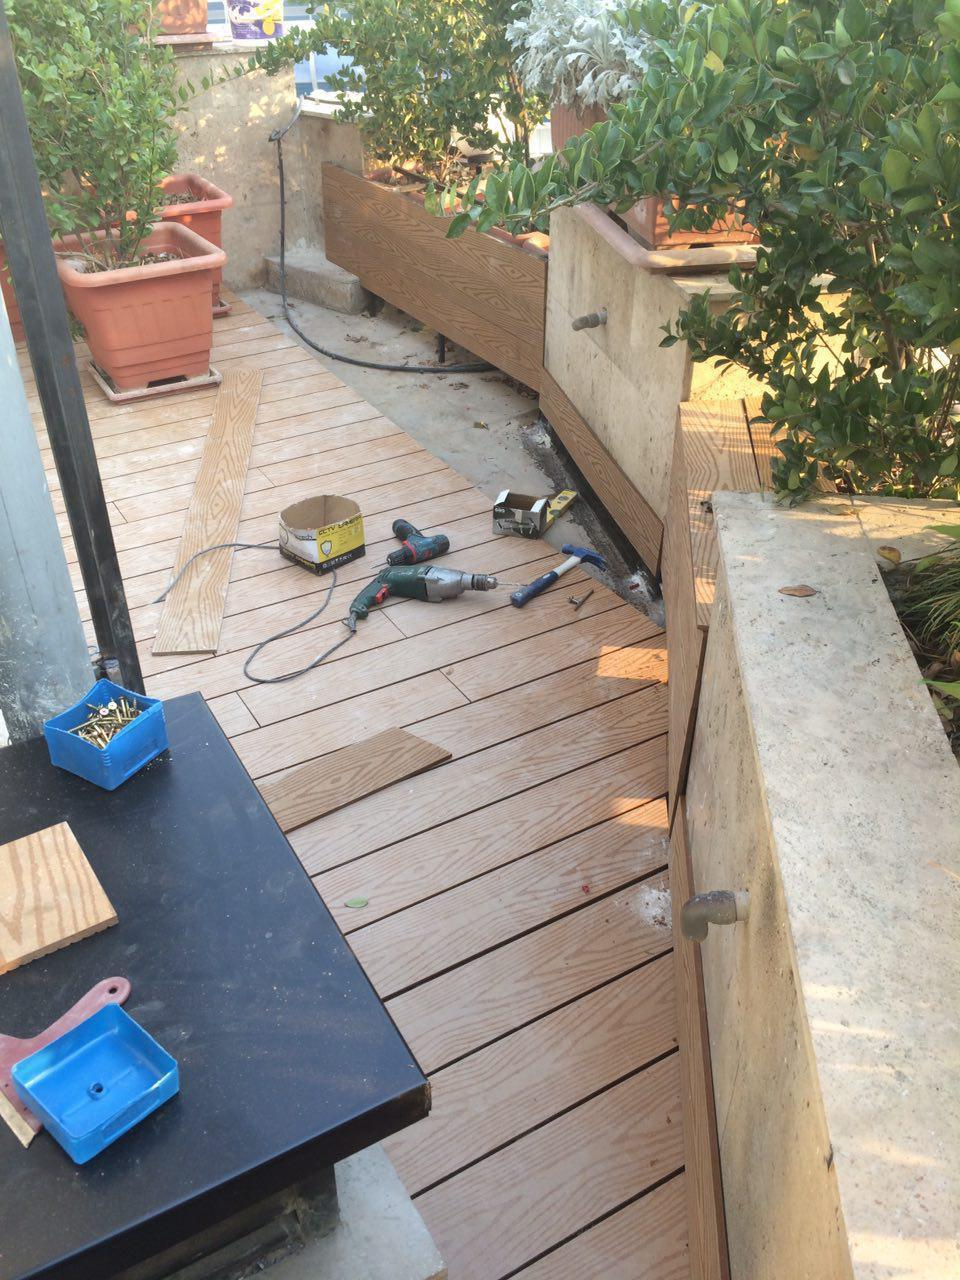 ساخت ویلا(چوبی،بتنی،پیش ساخته ....)